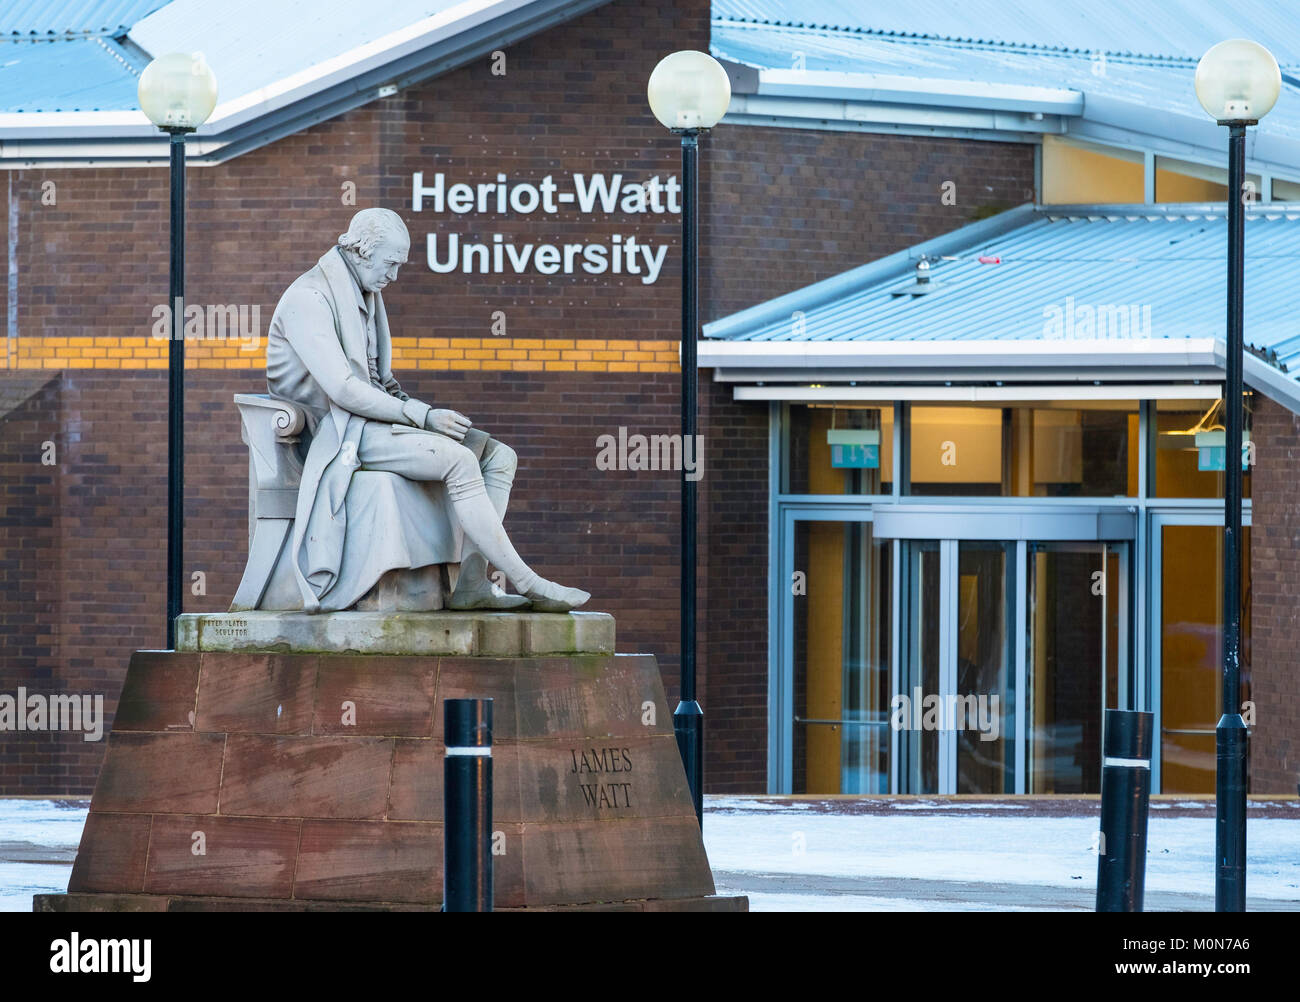 Heriot watt university stock photos heriot watt - International office university of edinburgh ...